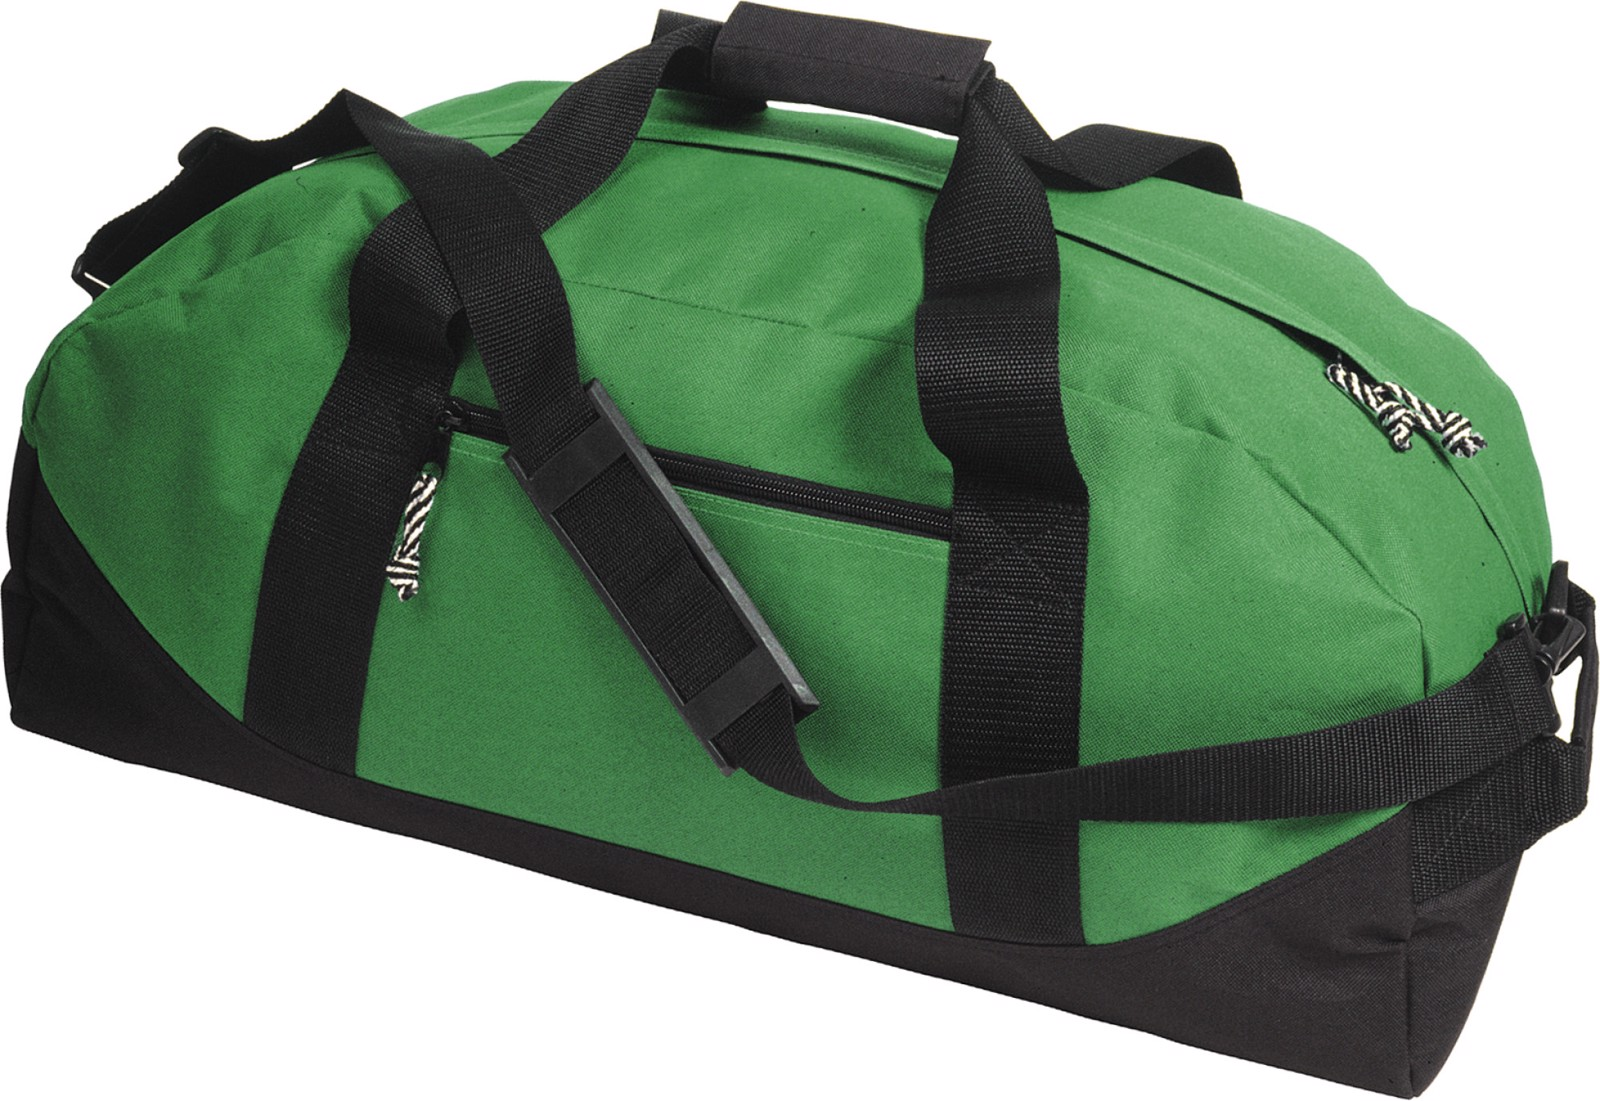 Polyester (600D) sports bag - Light Green